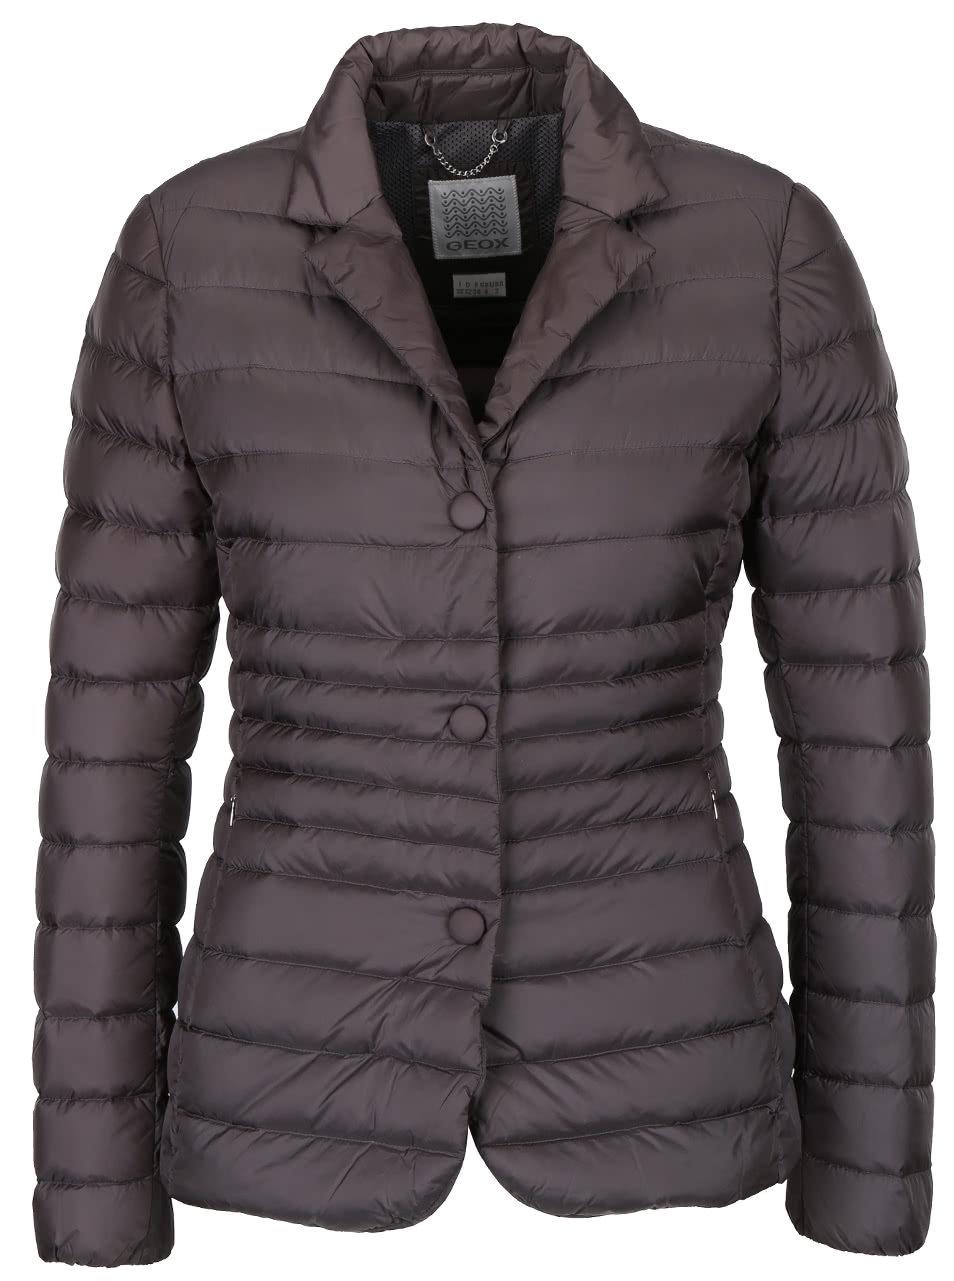 58b5f5ce3 Sivá dámska bunda s gombíkmi Geox Down | ZOOT.sk